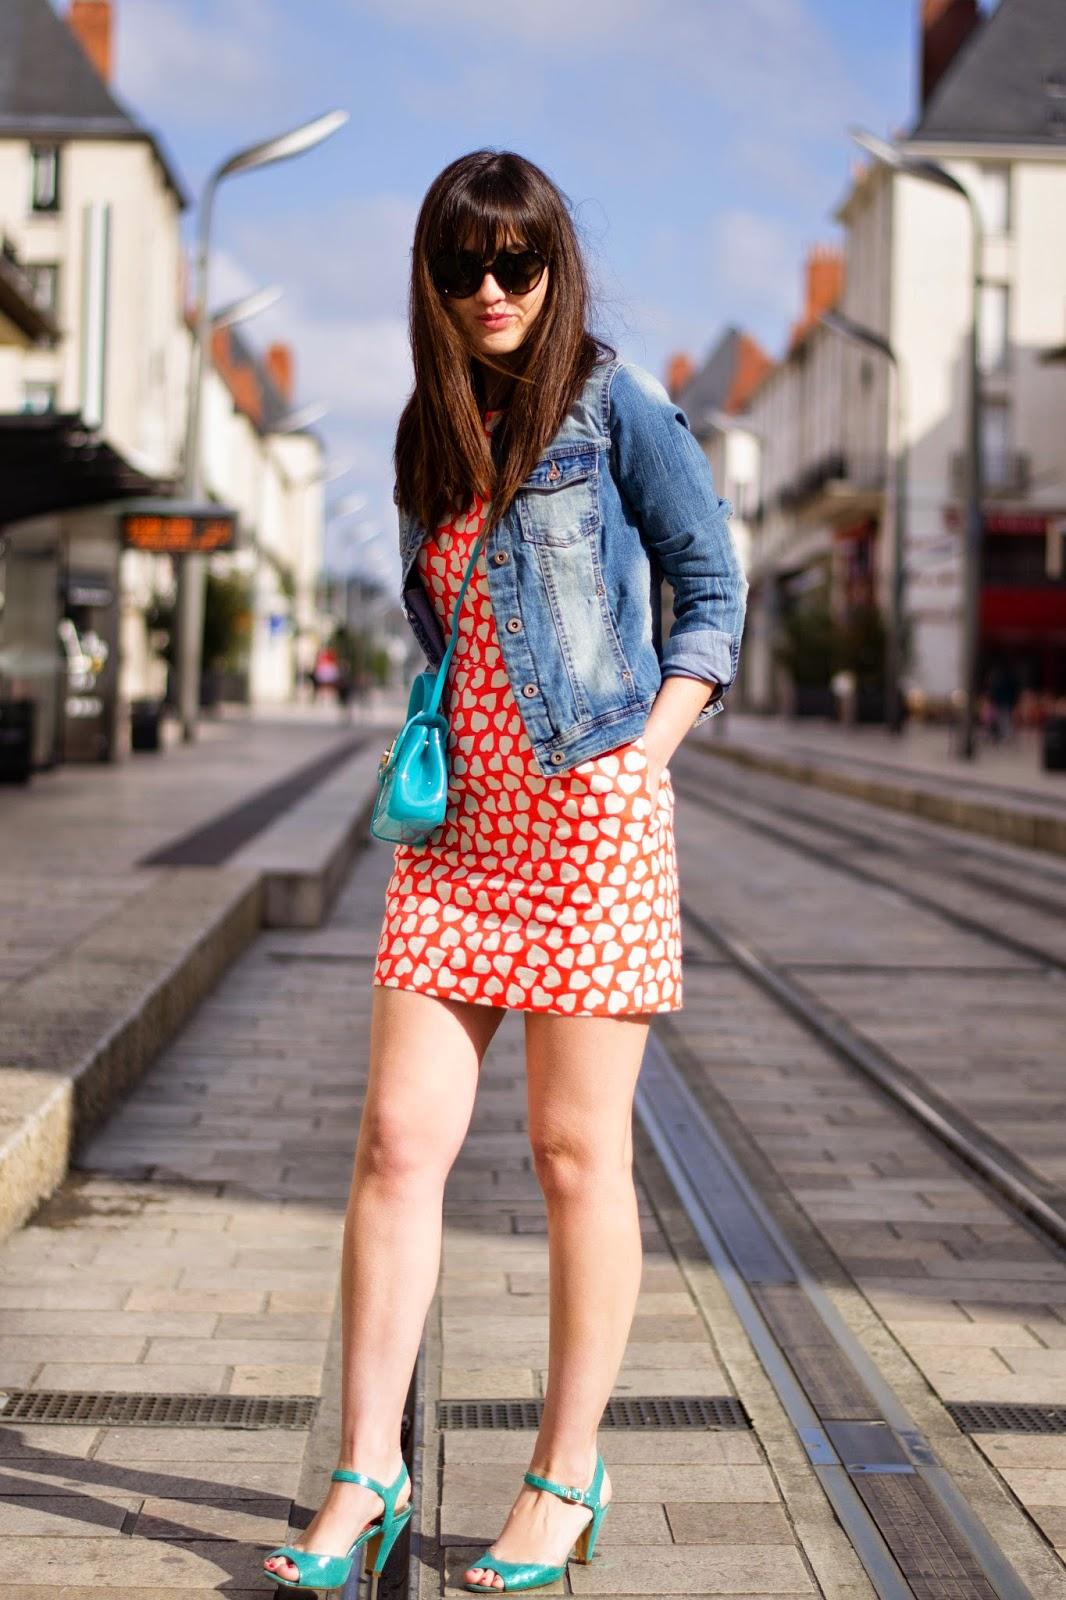 Spring fashion inspo